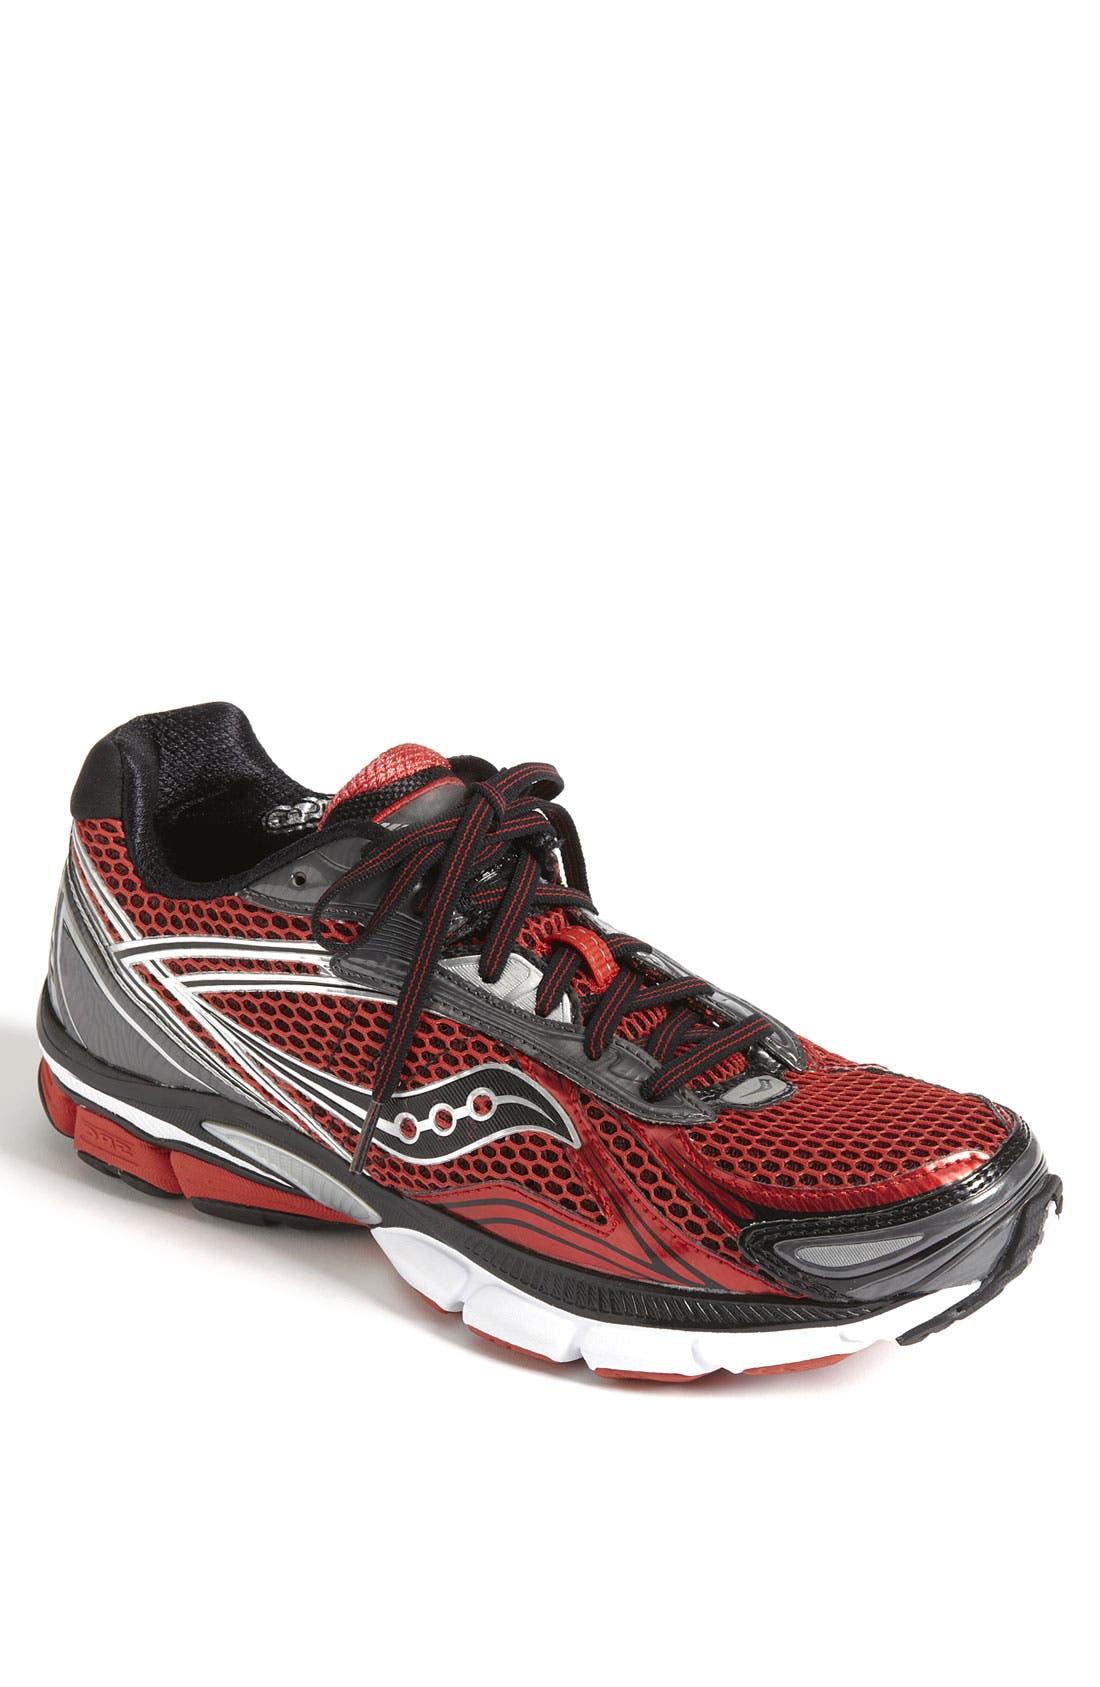 Alternate Image 1 Selected - Saucony 'PowerGrid Hurricane 14' Running Shoe (Men)